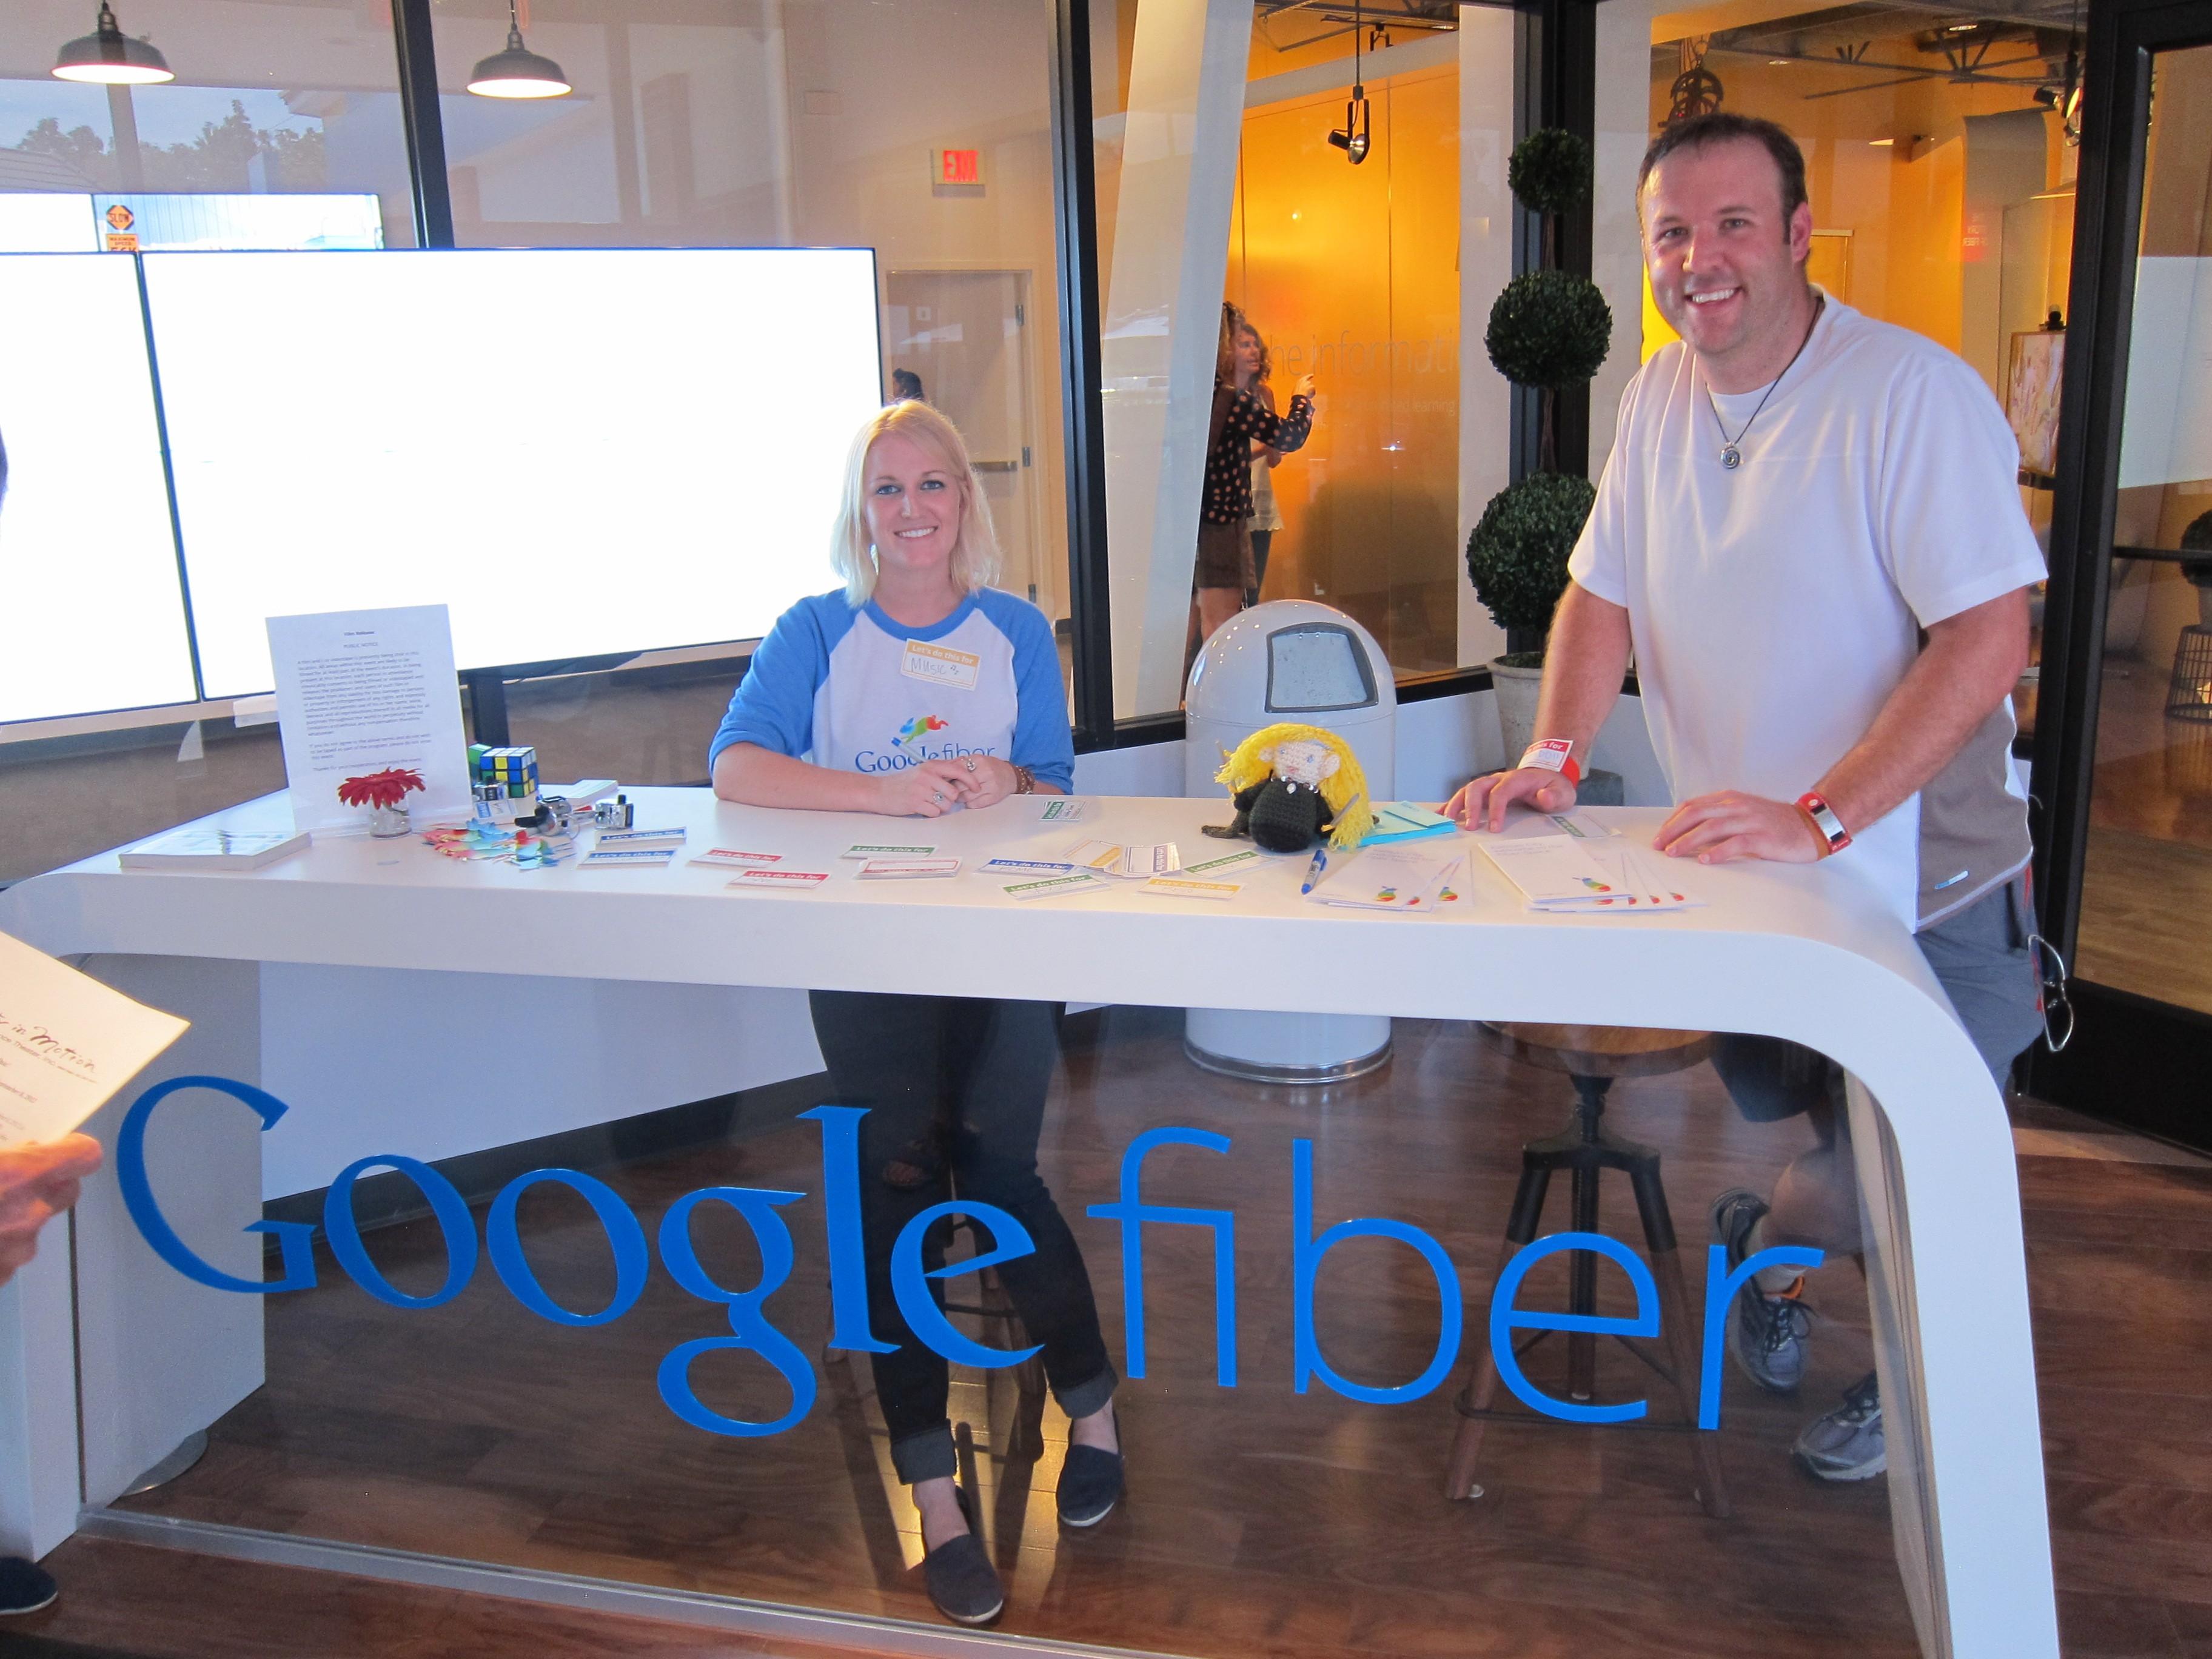 google office us google fiber goes to kansas city art deco style rosewood secretaire 494335